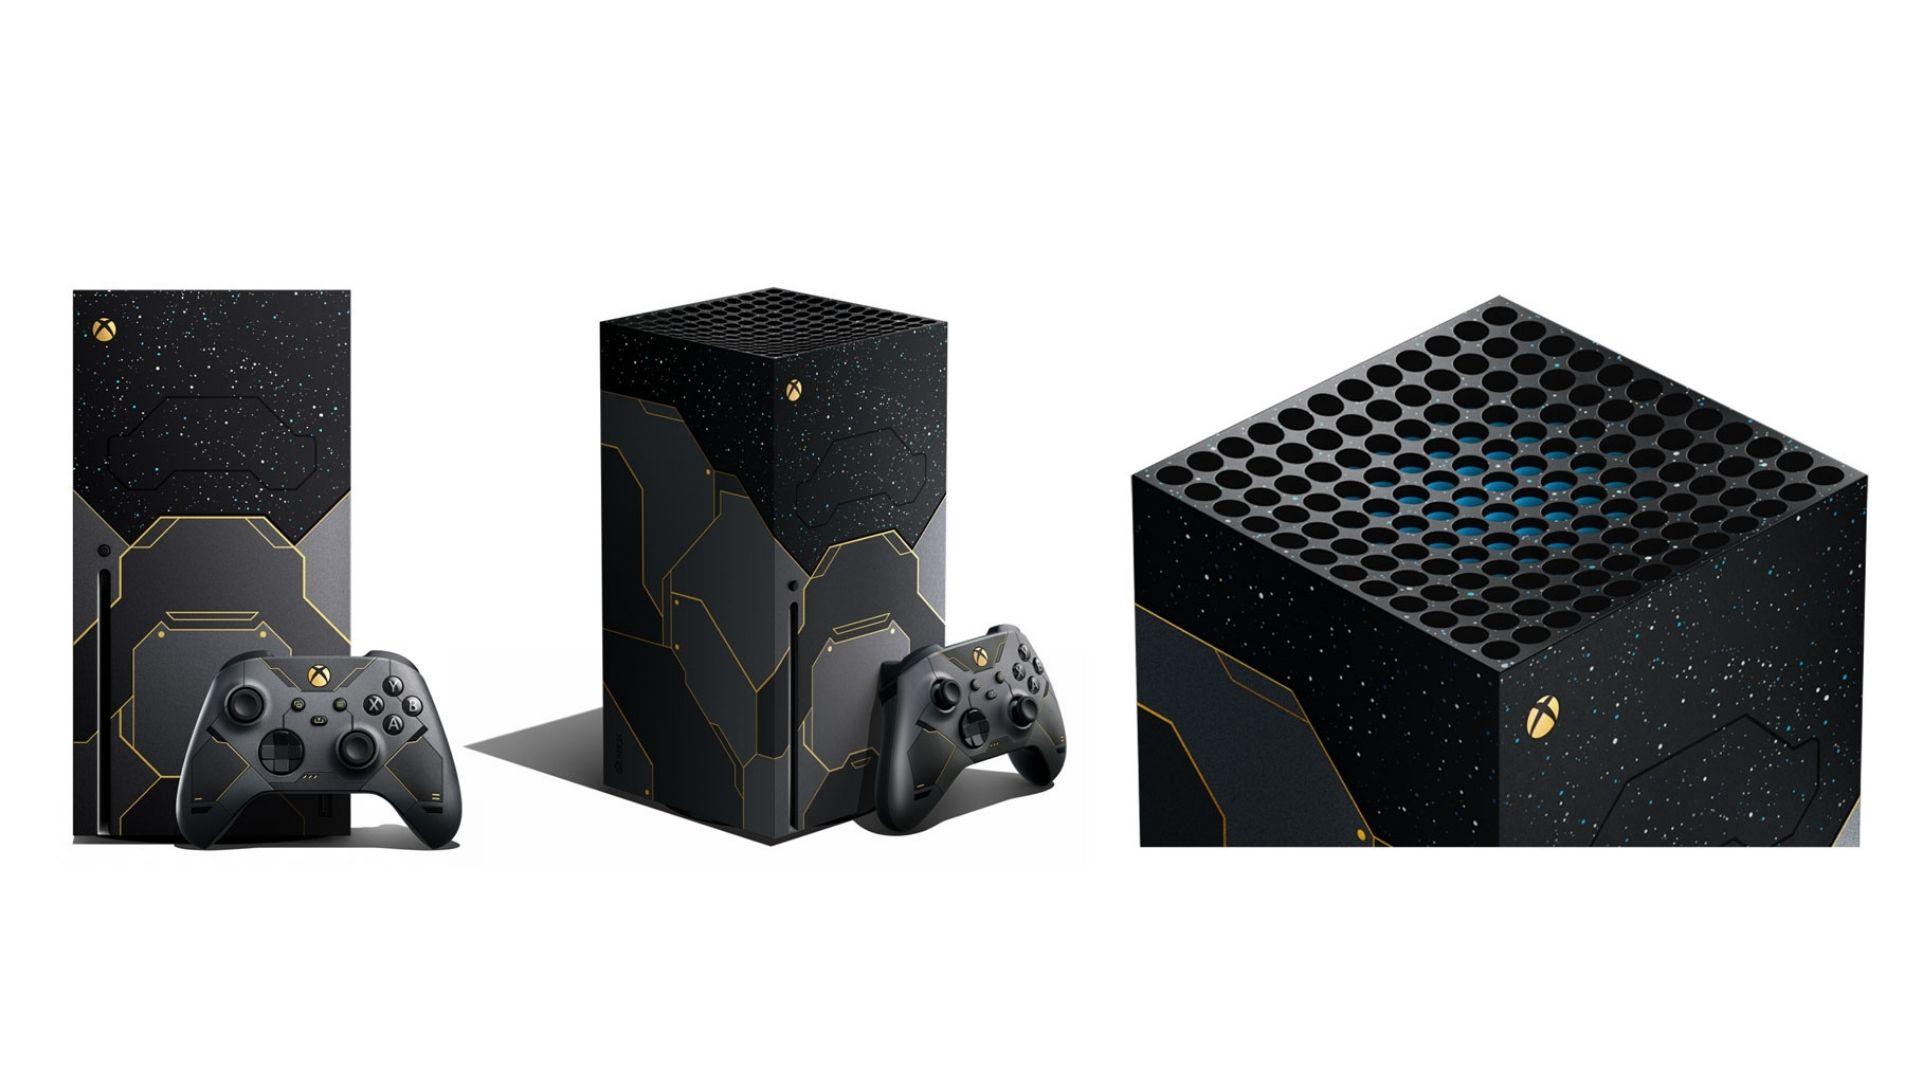 Halo Limited Edition Konsole